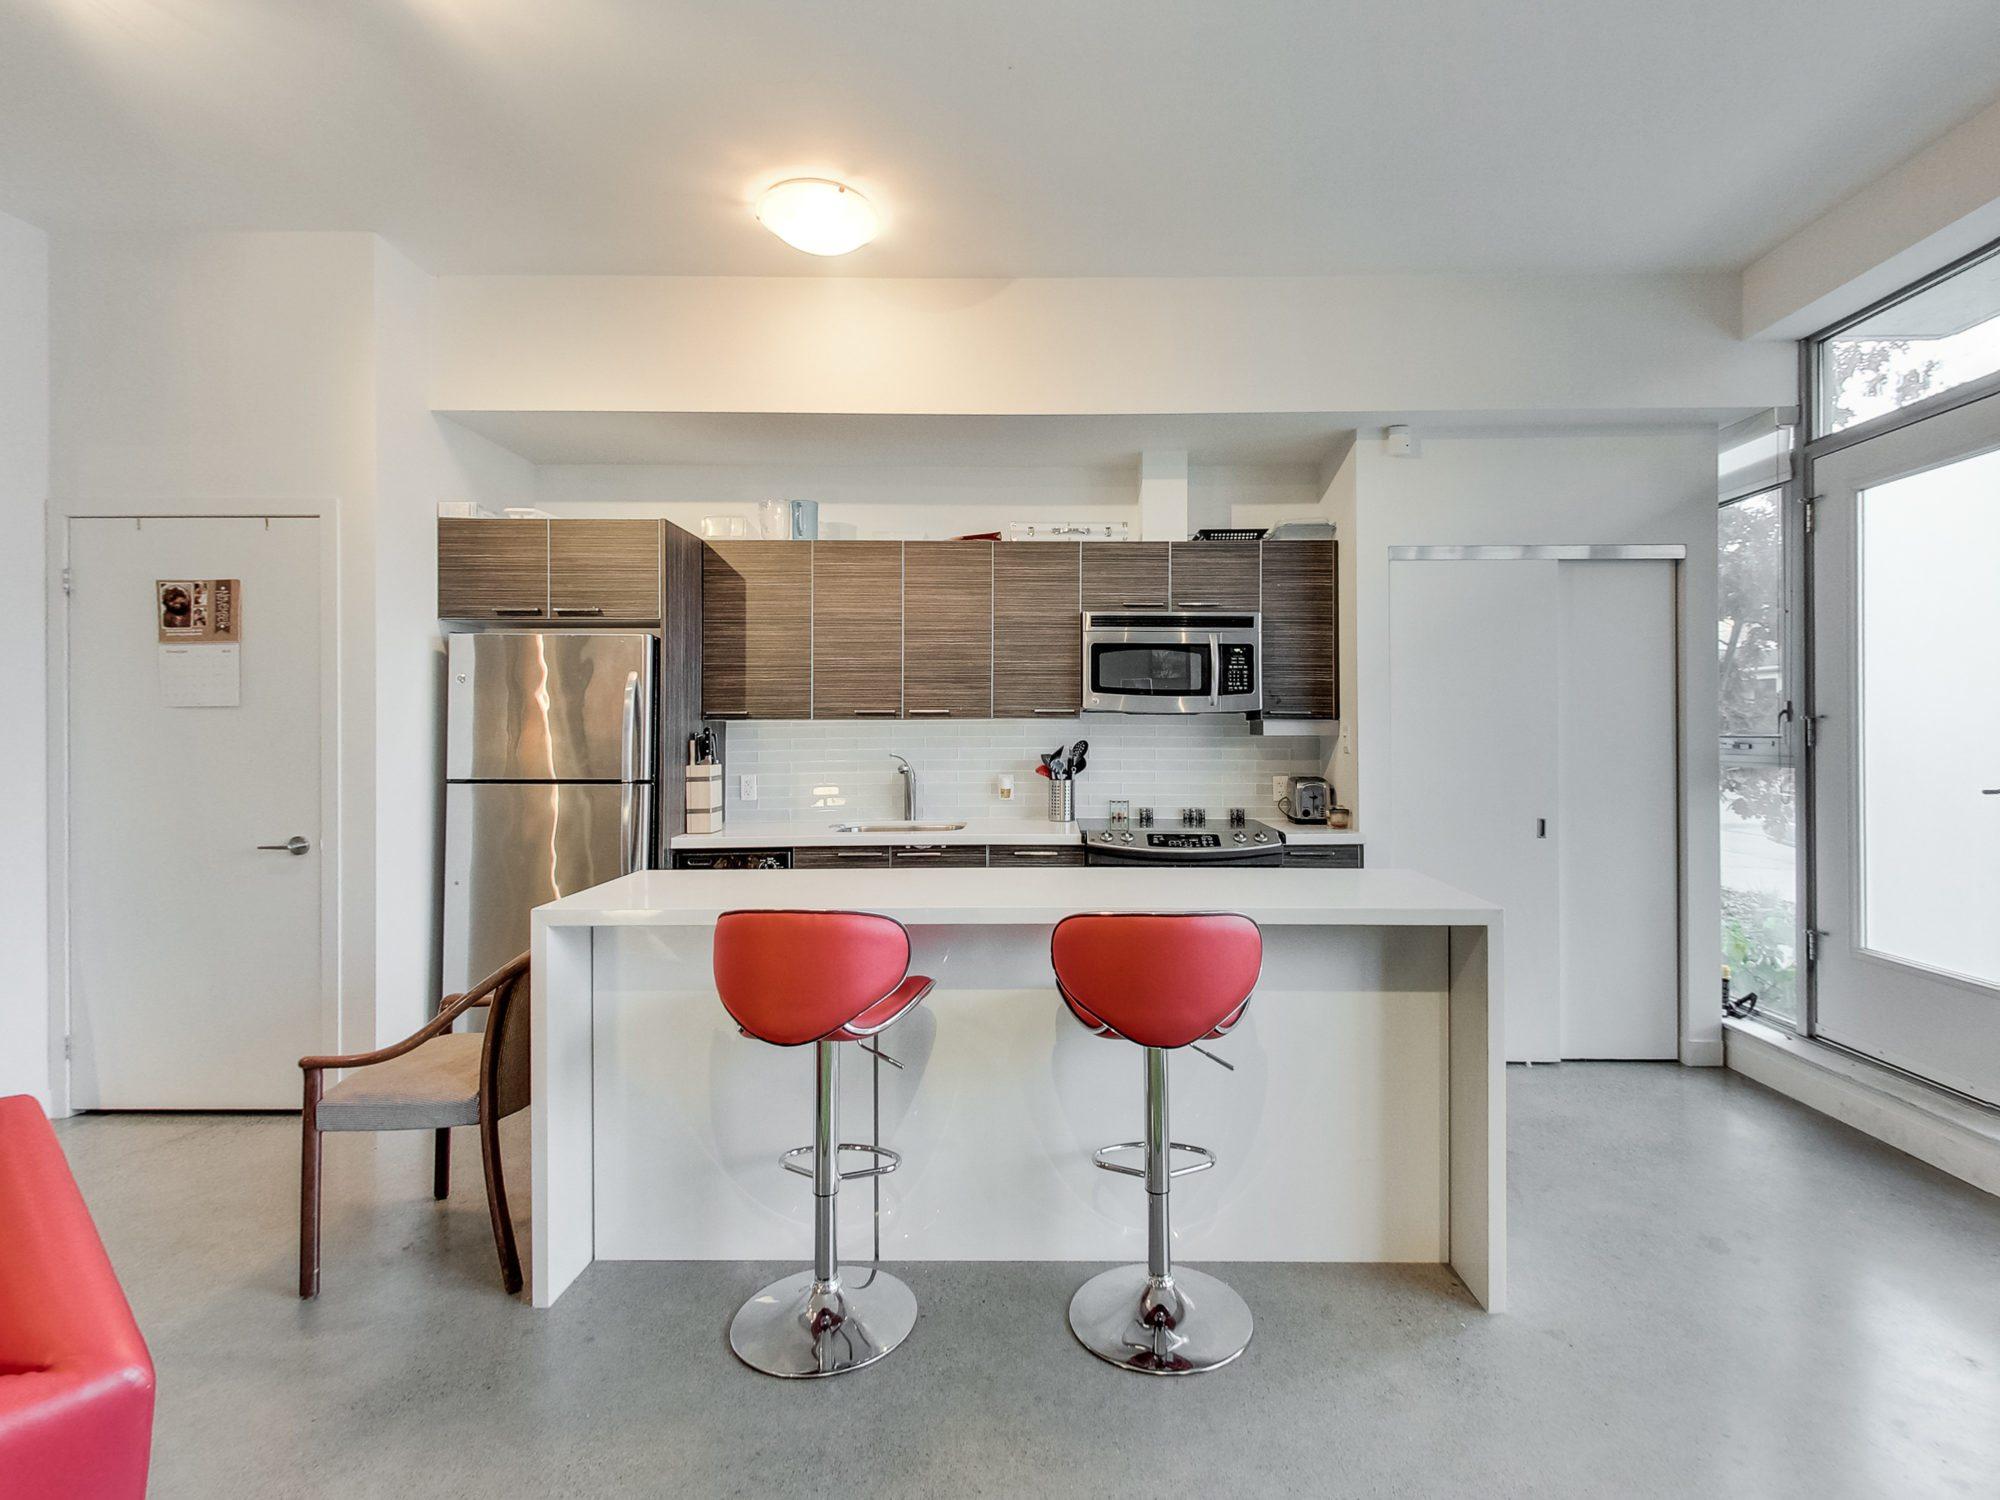 toronto-real-estate-condo-of-the-week-52-sumach-street-kitchen